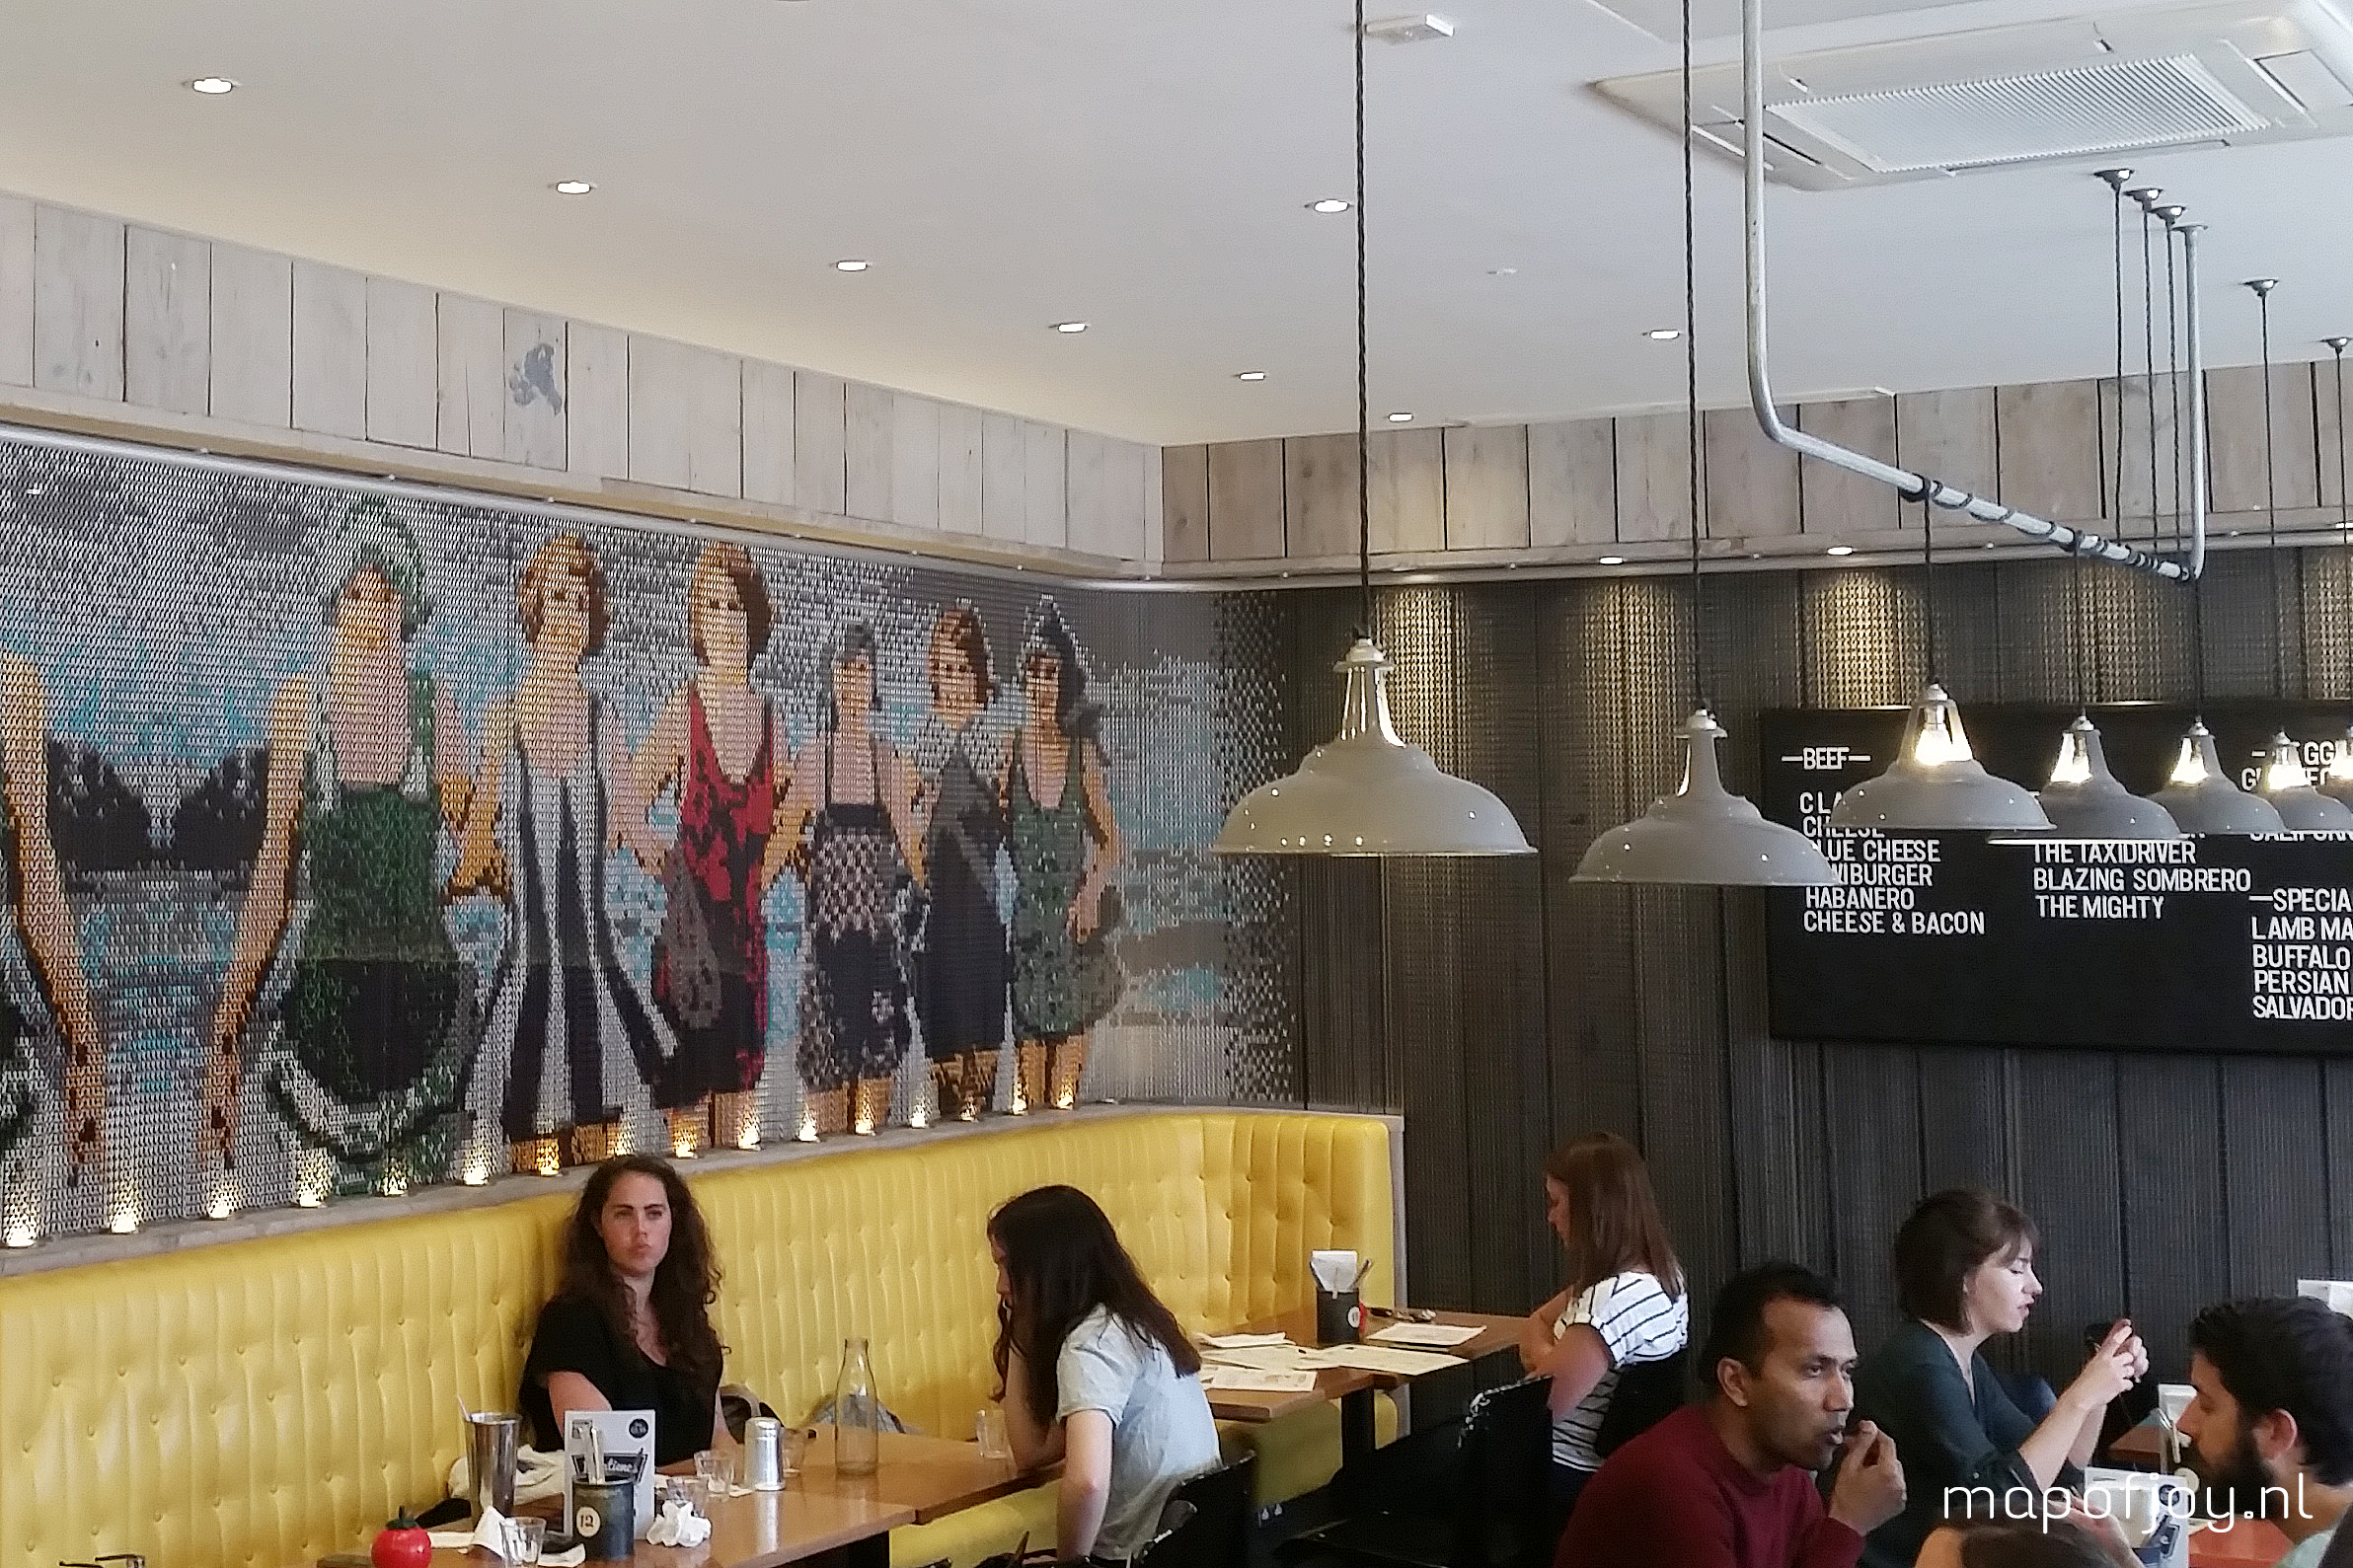 gourmet-burger-kitchen-brighton-map-of-joy4